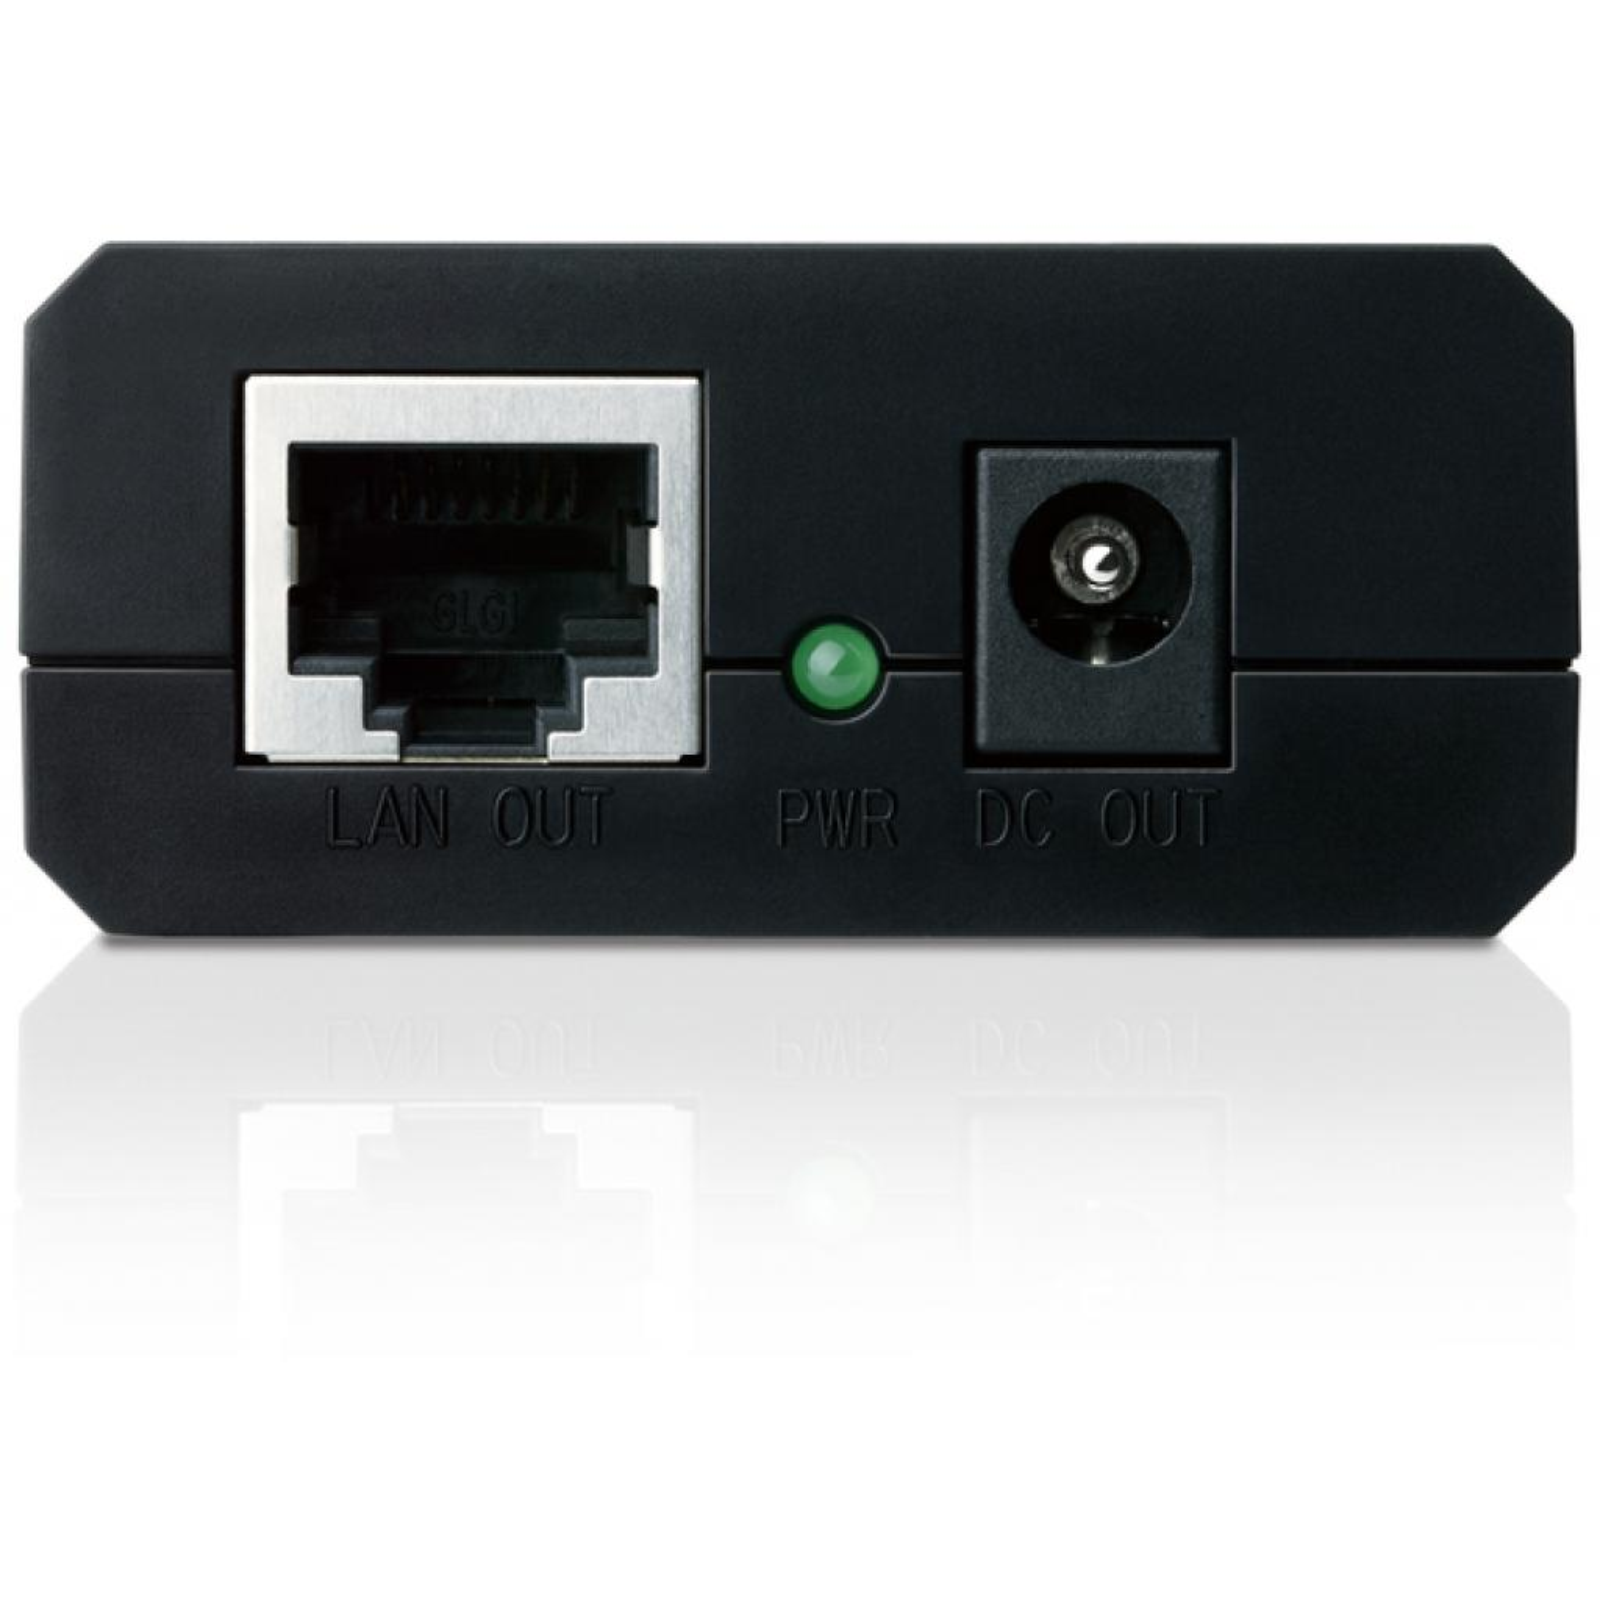 Адаптер PoE TP-Link TL-PoE10R изображение 3